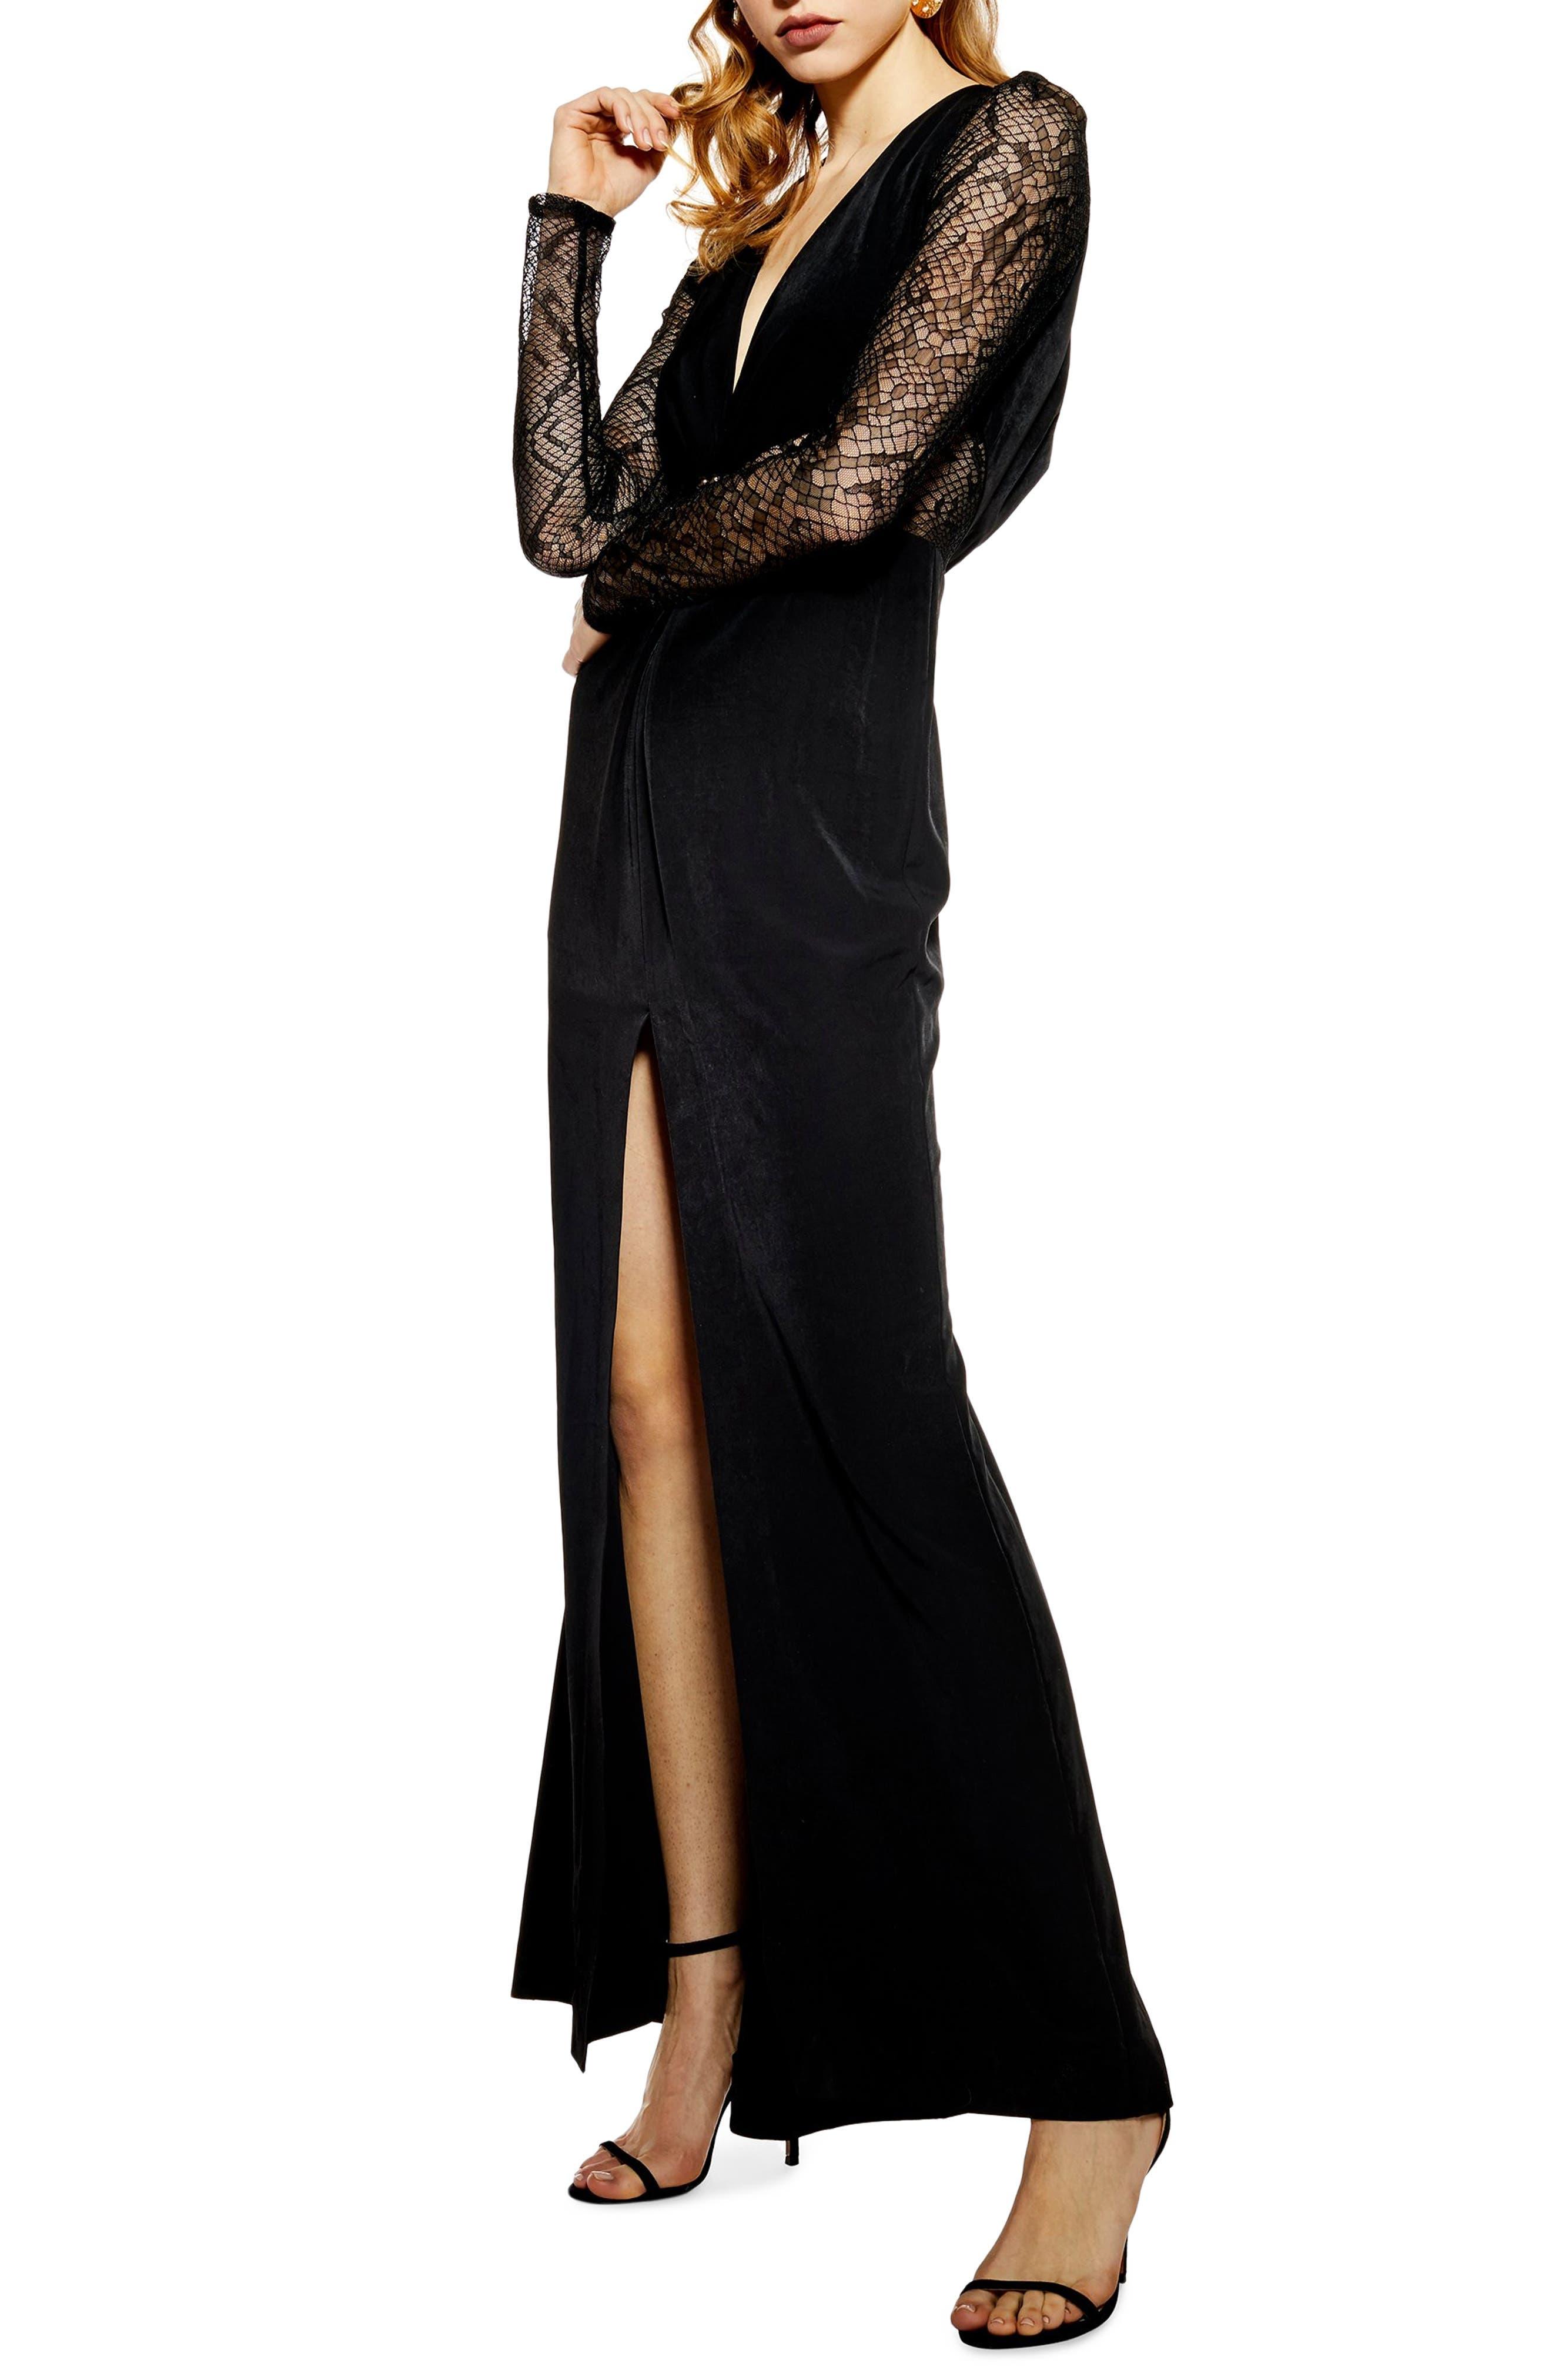 Topshop Long Lace Sleeve Formal Maxi Dress, US (fits like 0-2) - Black